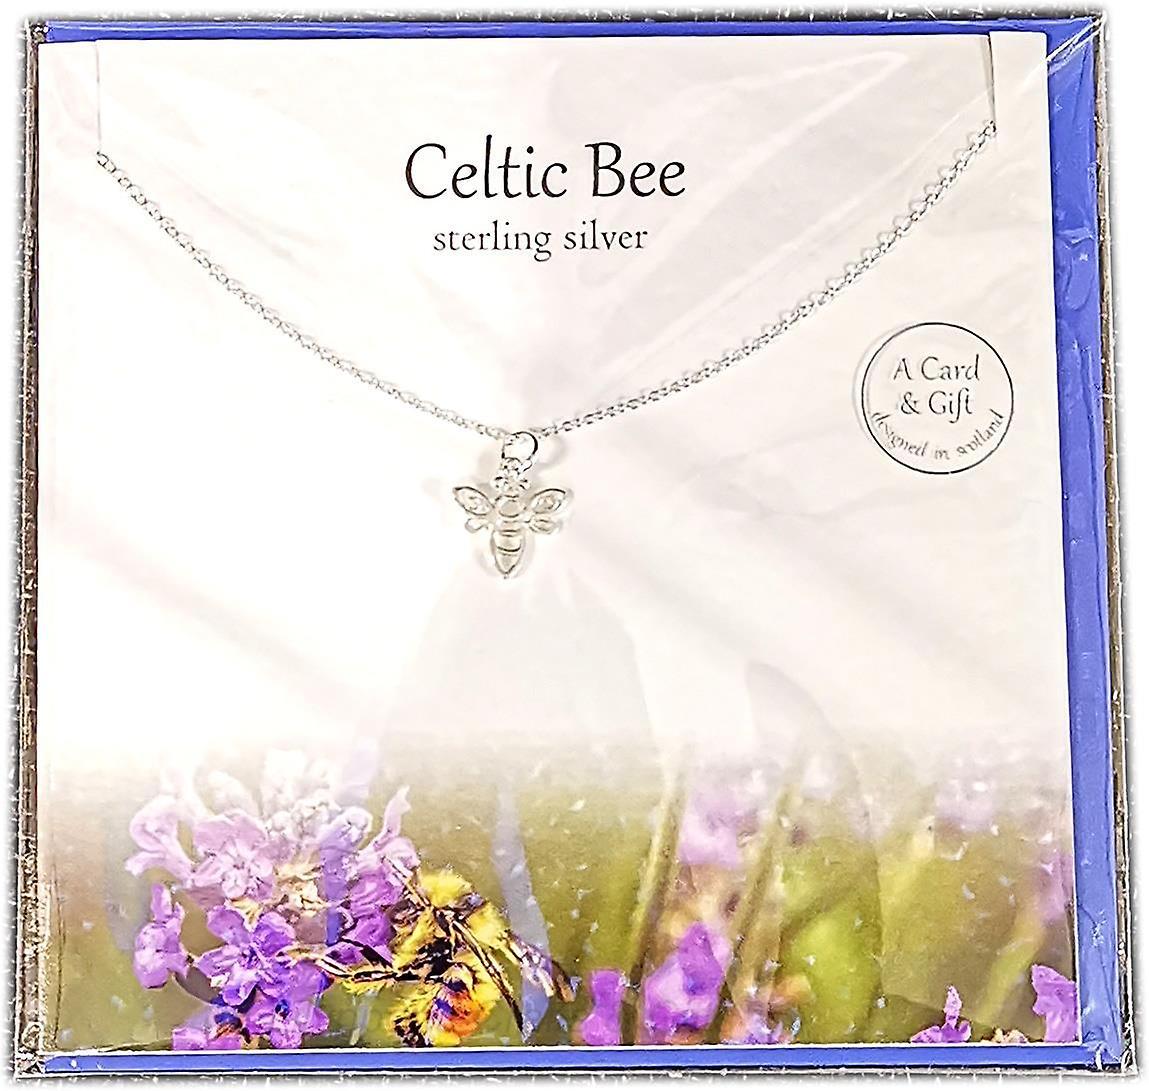 The Silver Studio Scottish Collection Celtic Bee Pendant Card